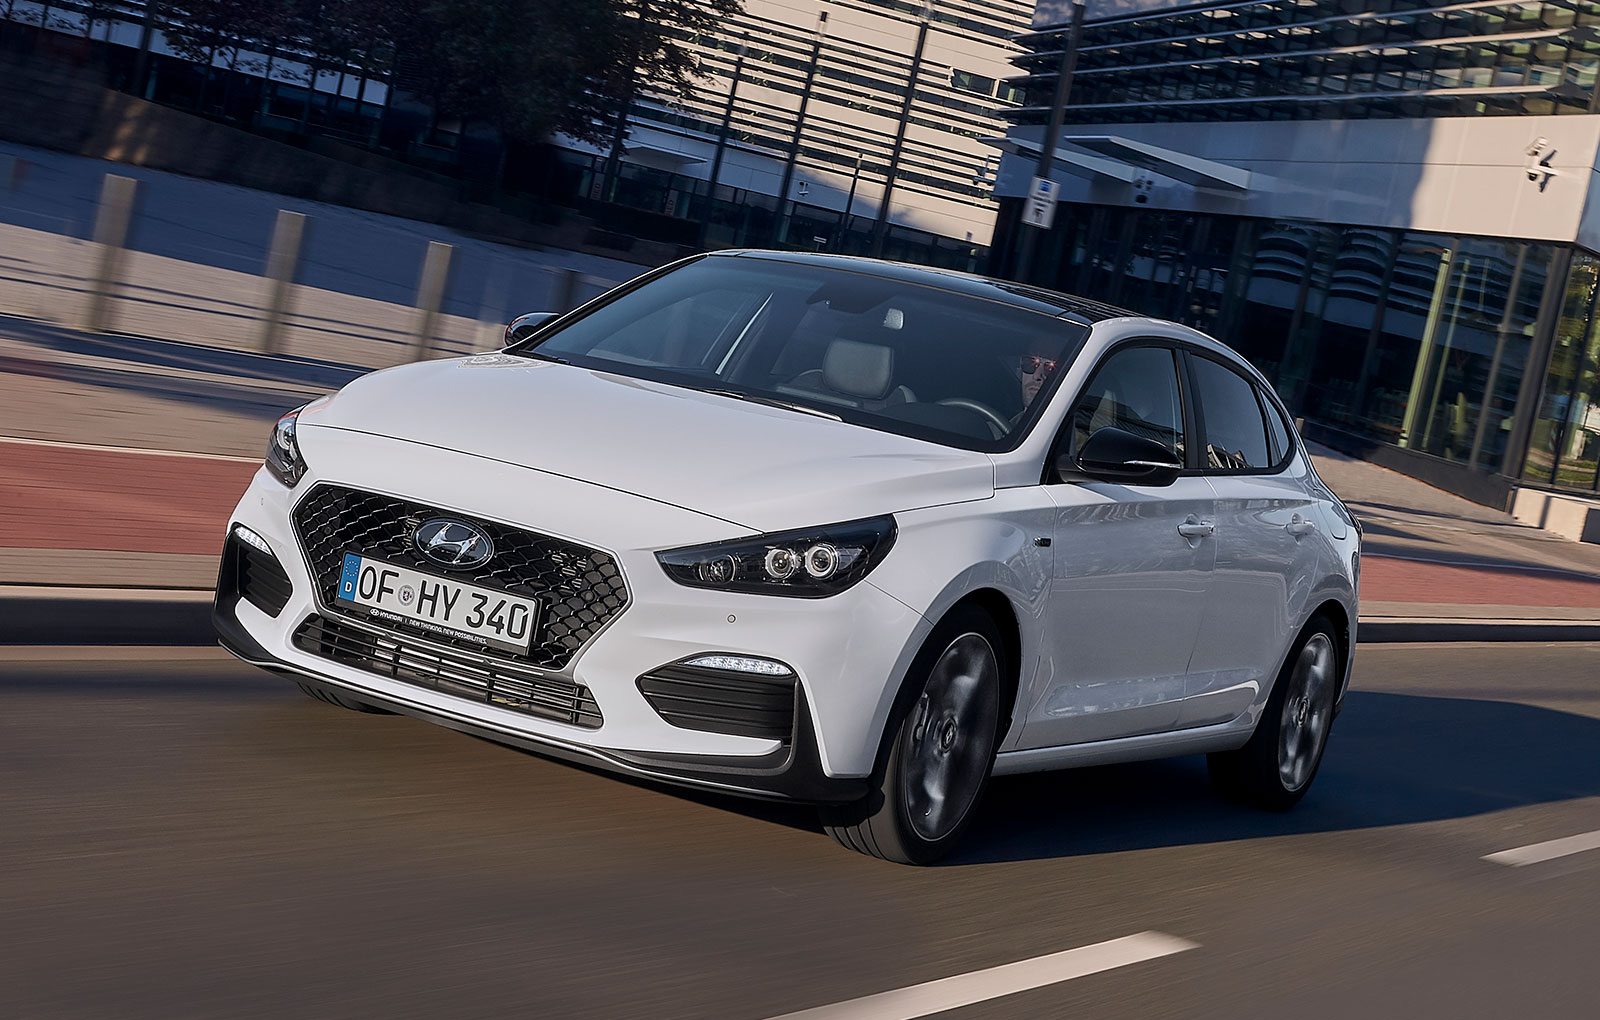 2017 - [Hyundai] i30 Fastback - Page 3 352178l